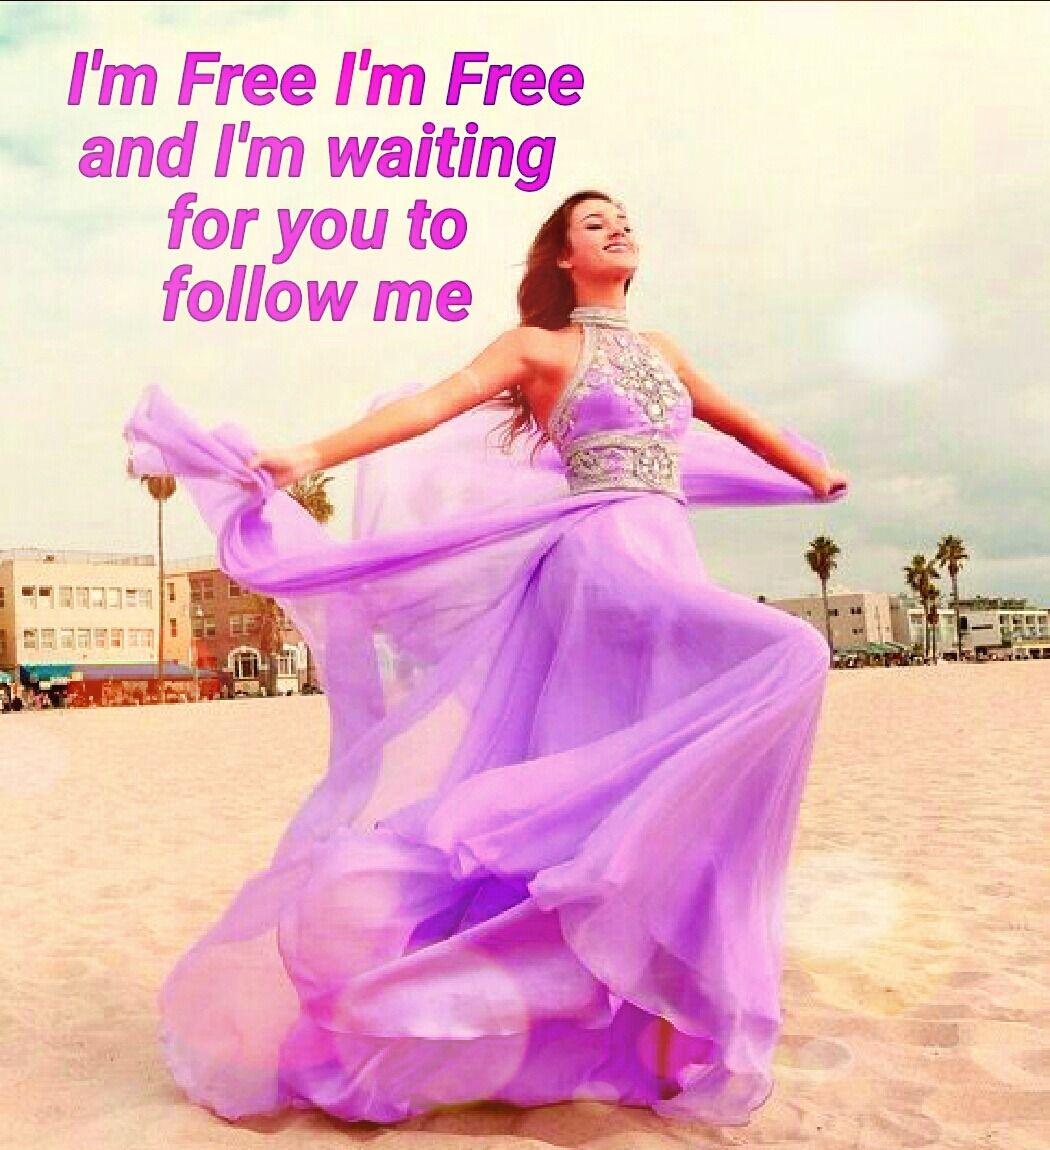 Be Free | Sissy captions | Pinterest | Captions, Feminine and ...